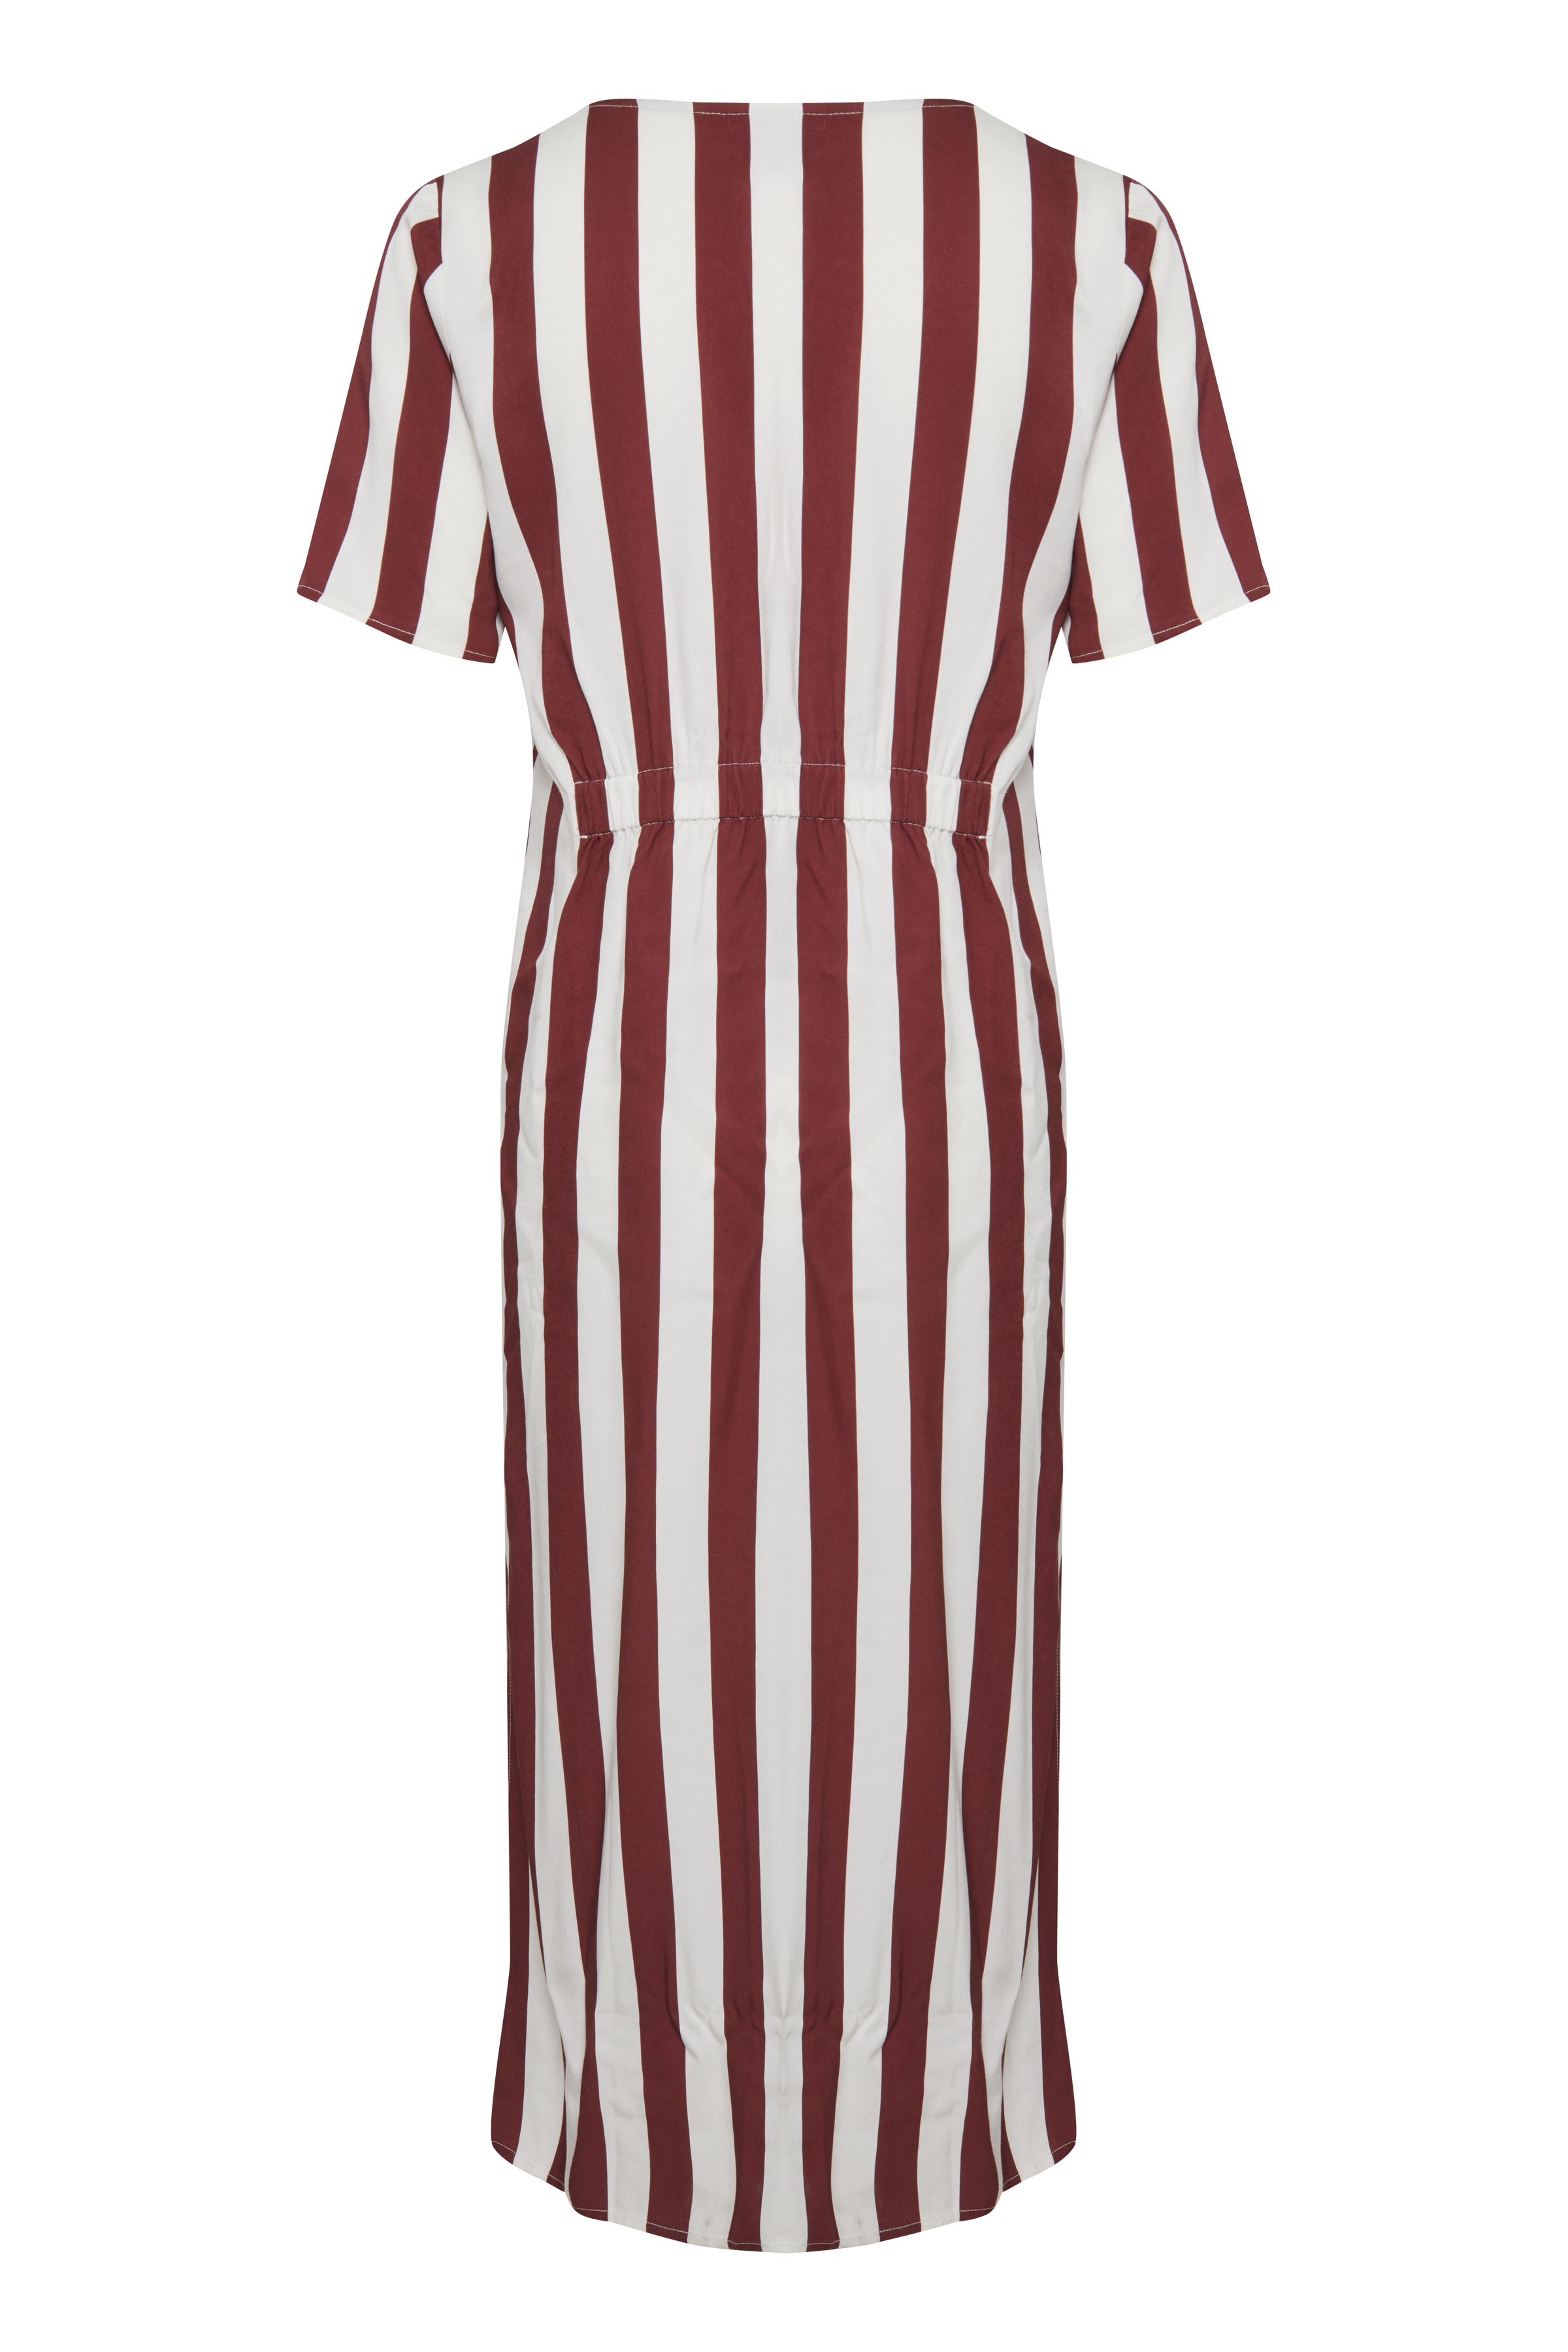 Apple Butter Dress fra Ichi – Køb Apple Butter Dress fra str. XS-XL her